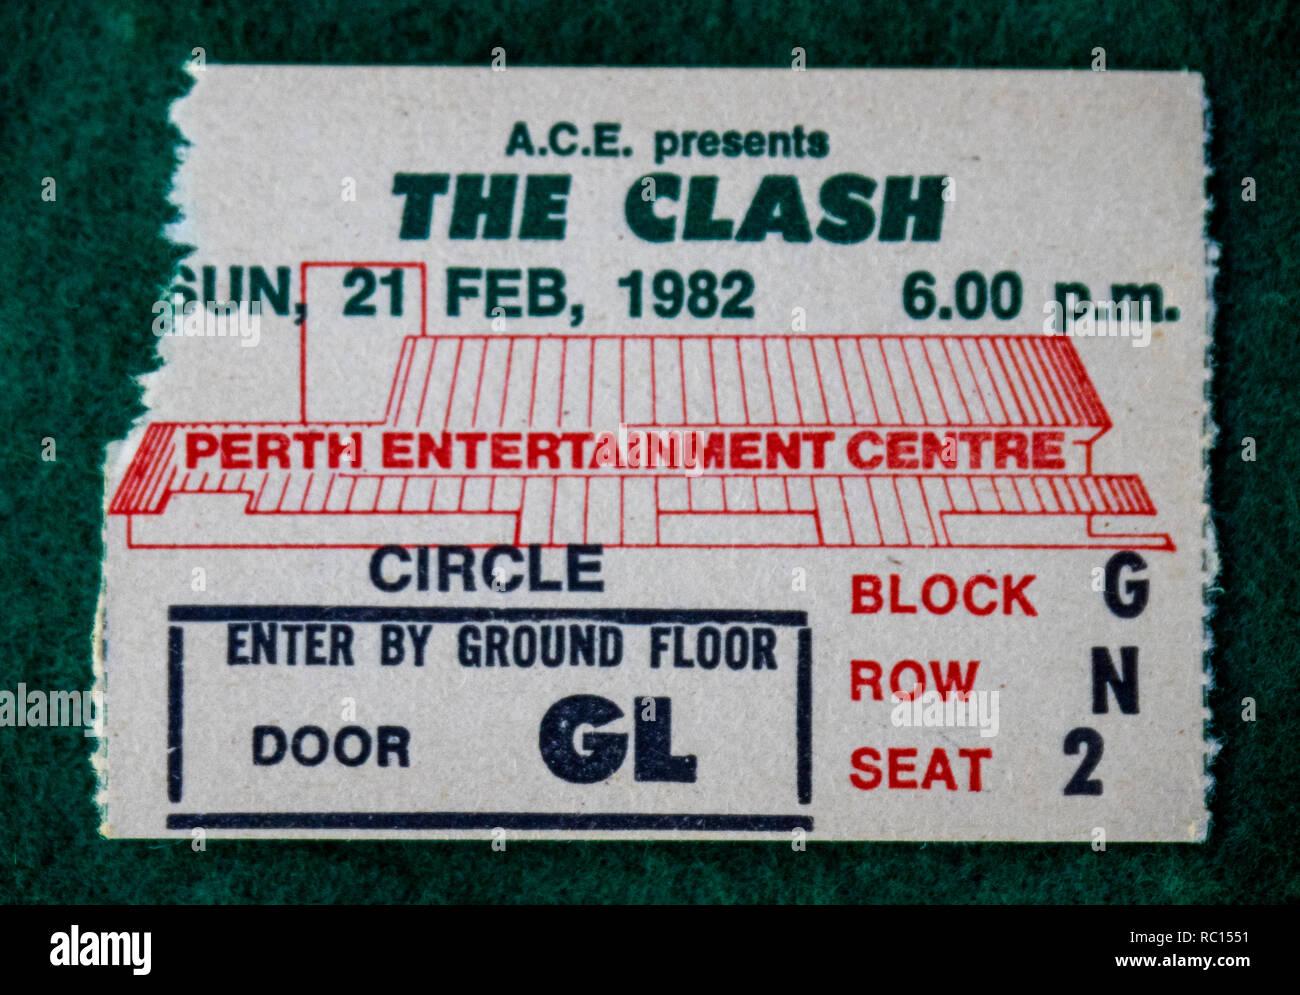 Ticket for The Clash concert at Perth Entertainment Centre in 1982 WA Australia. Stock Photo